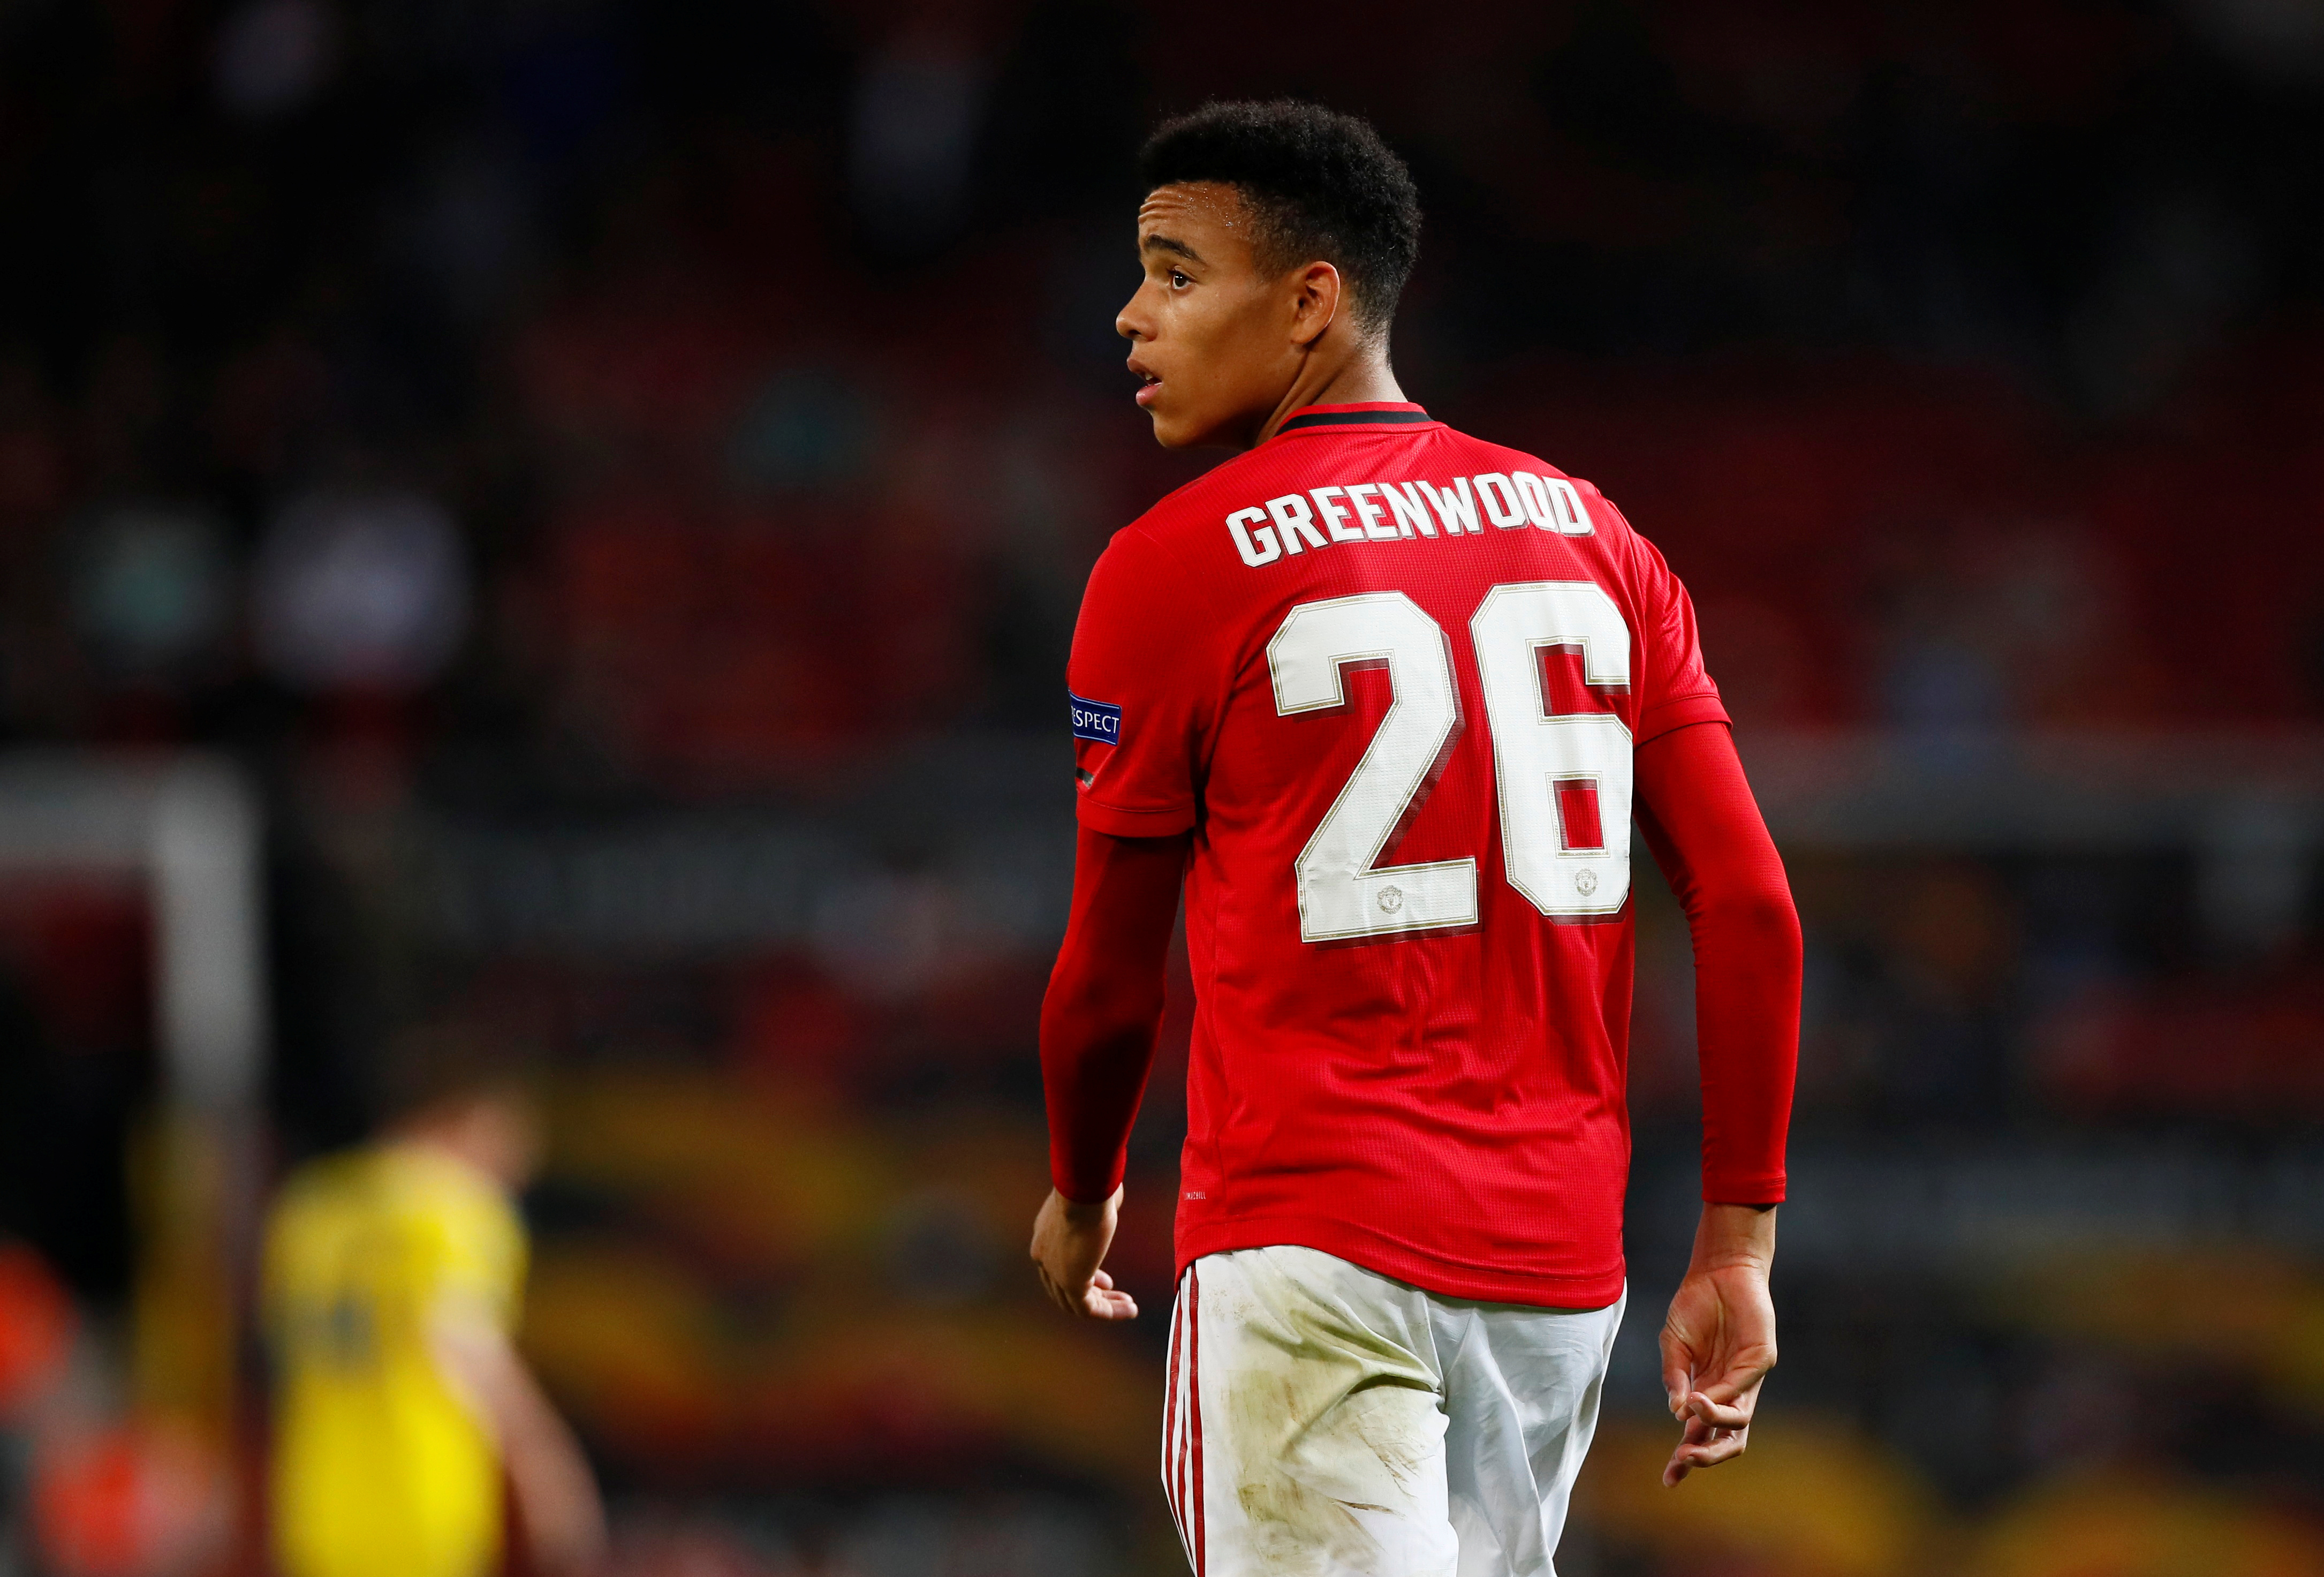 Fans react to Mason Greenwood's Europa League goal